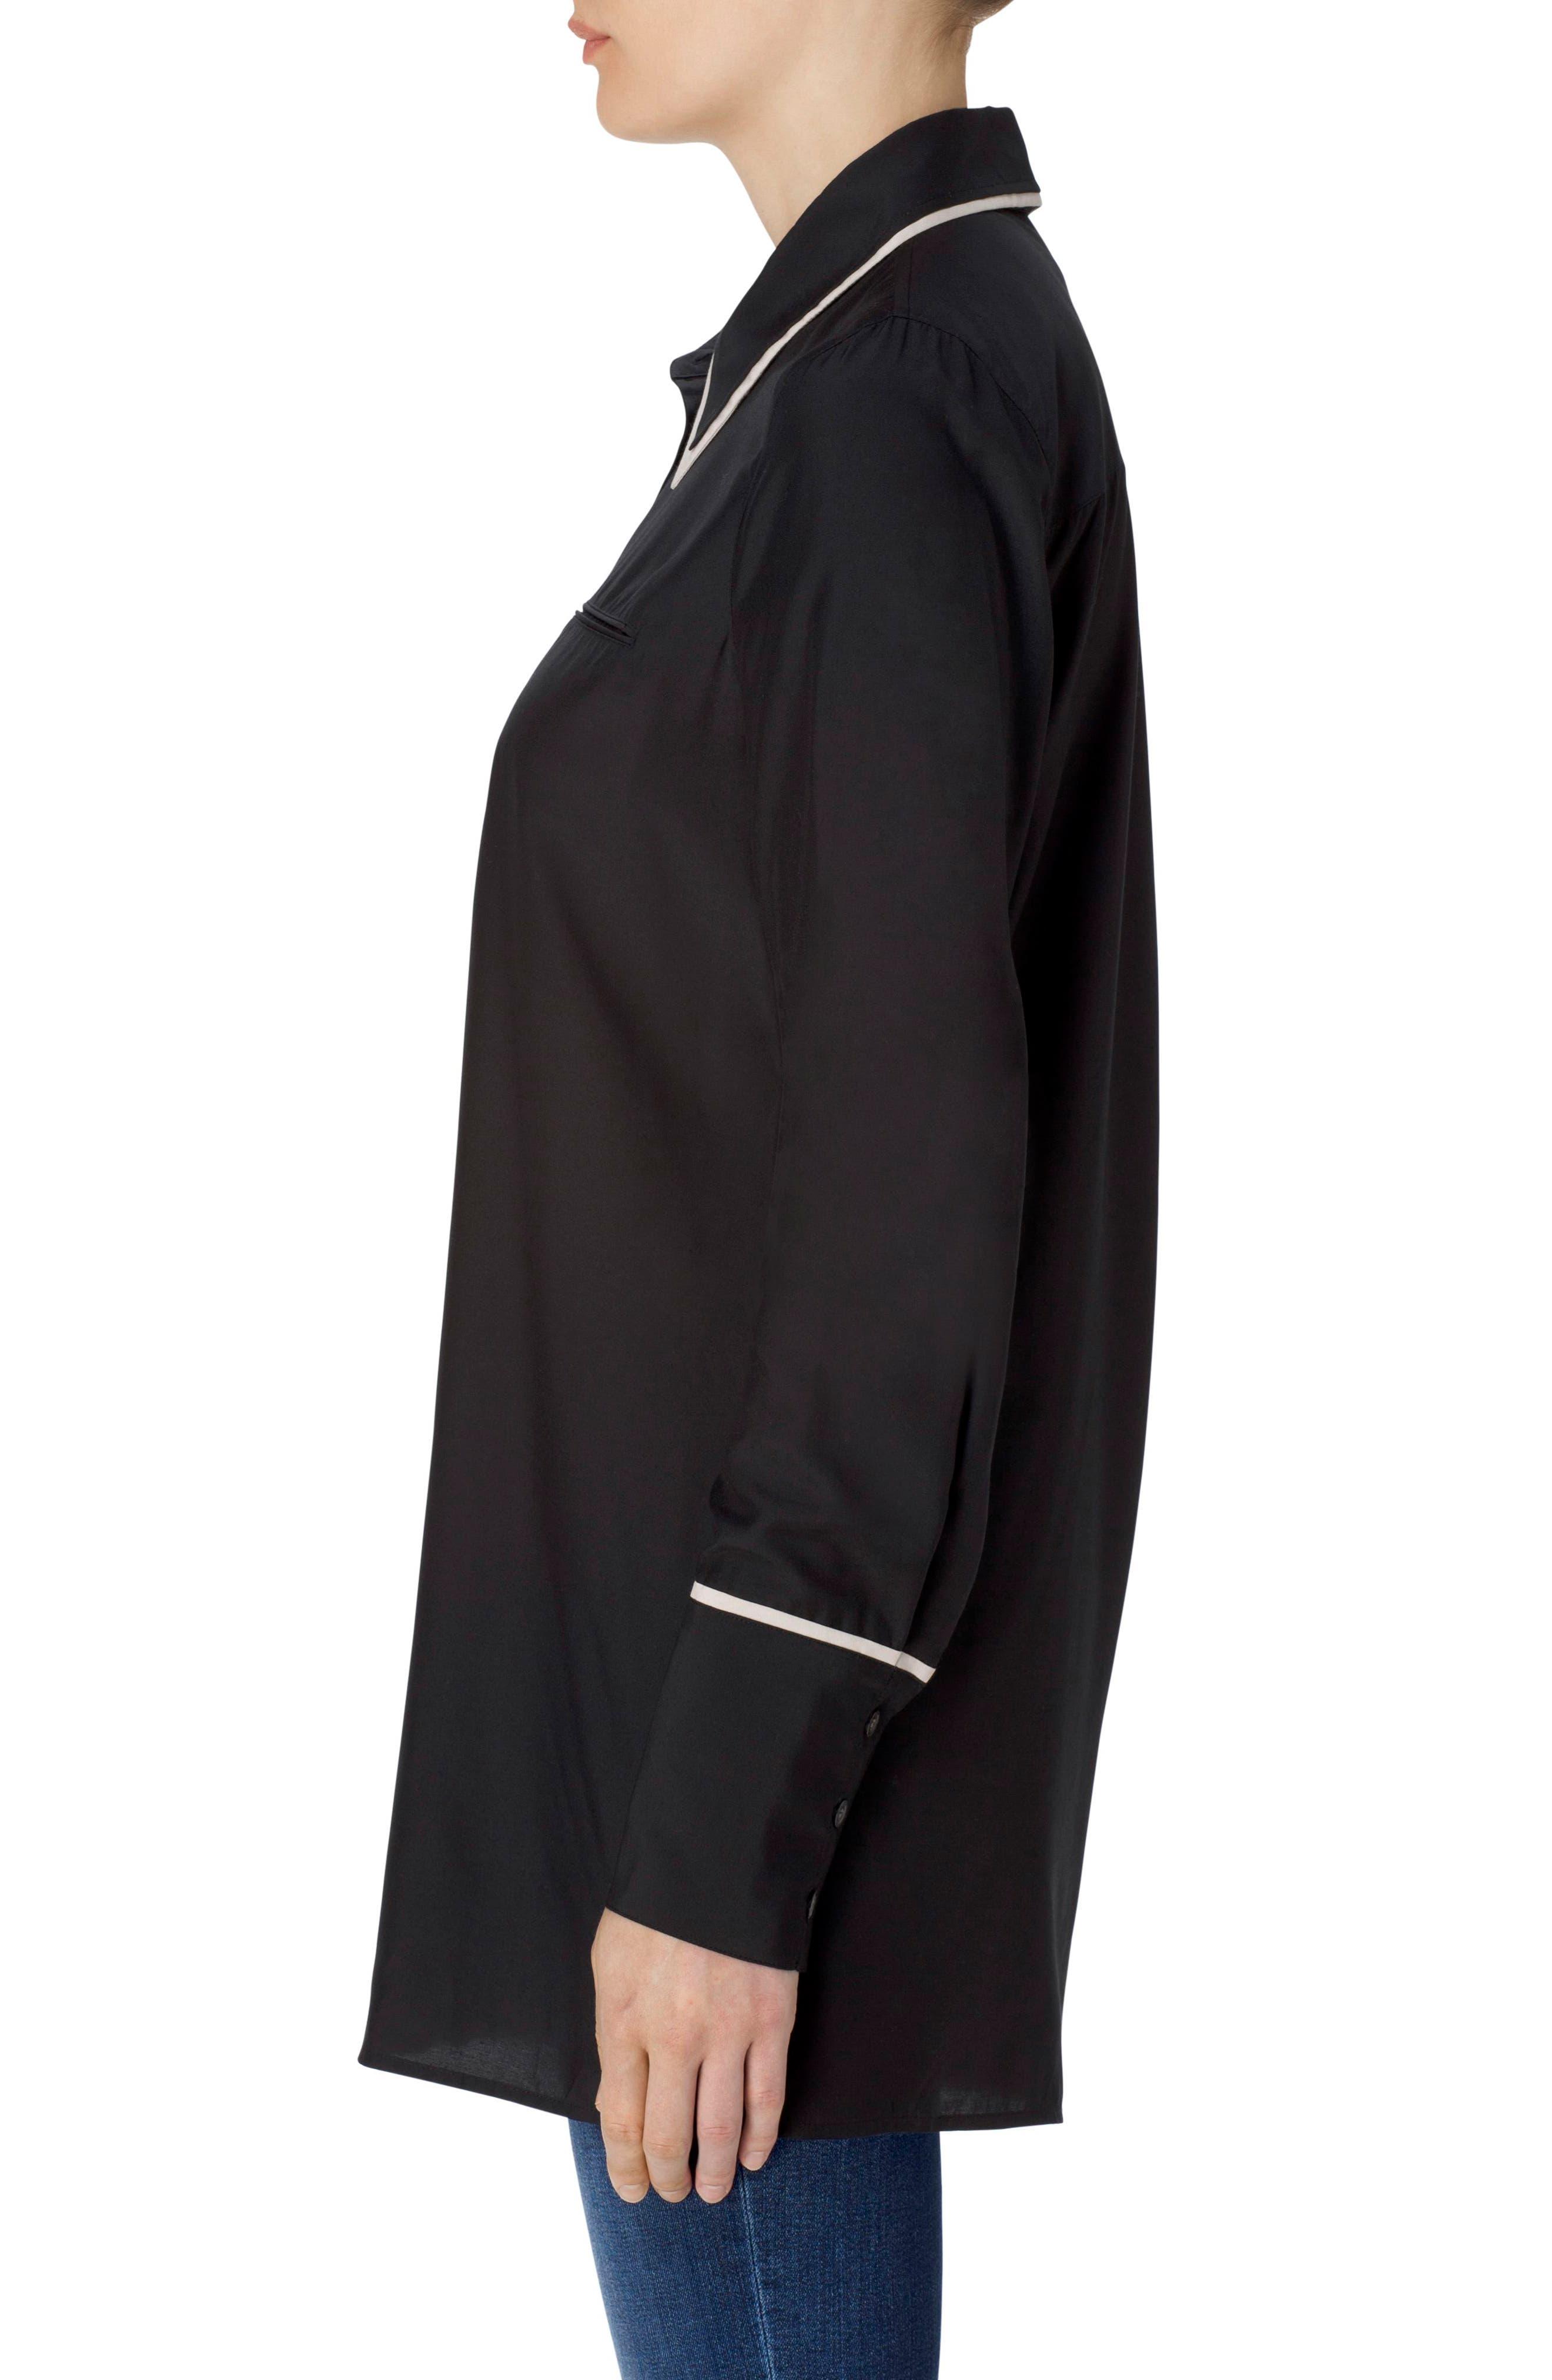 Blake Oversize Shirt,                             Alternate thumbnail 3, color,                             001